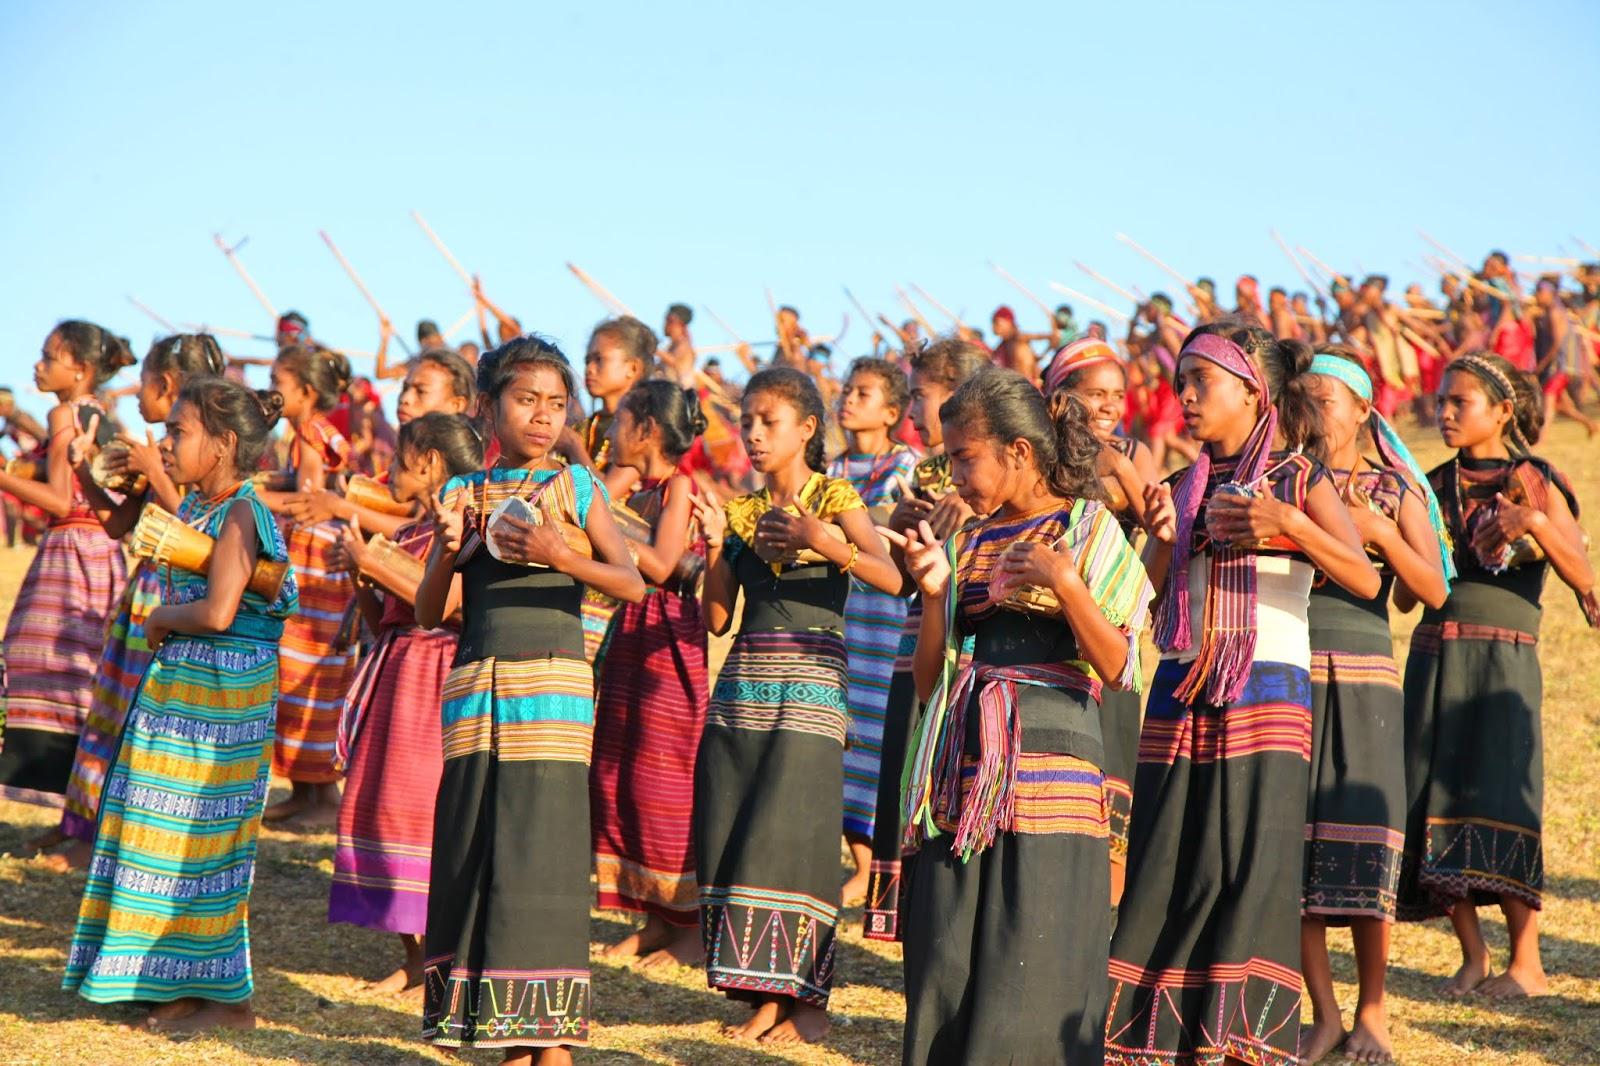 Wisata Budaya NTT yang Menjadi Kekayaan Indonesia